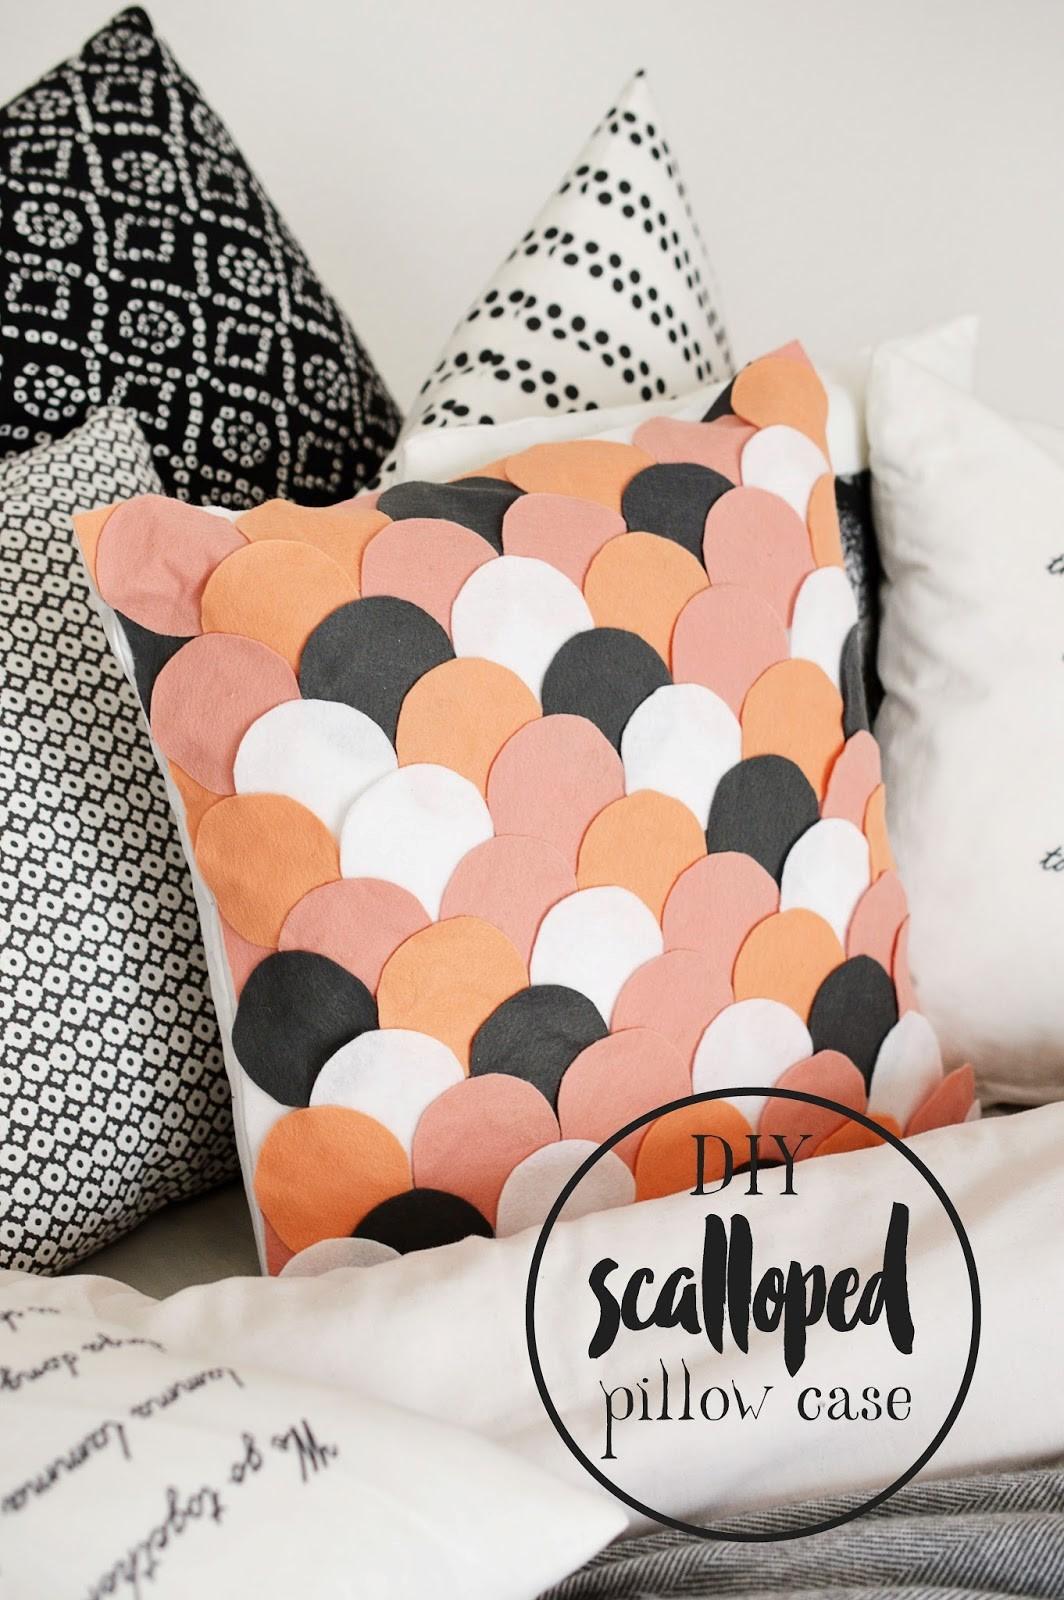 6 Accentuate Your Pillow Case via simphome